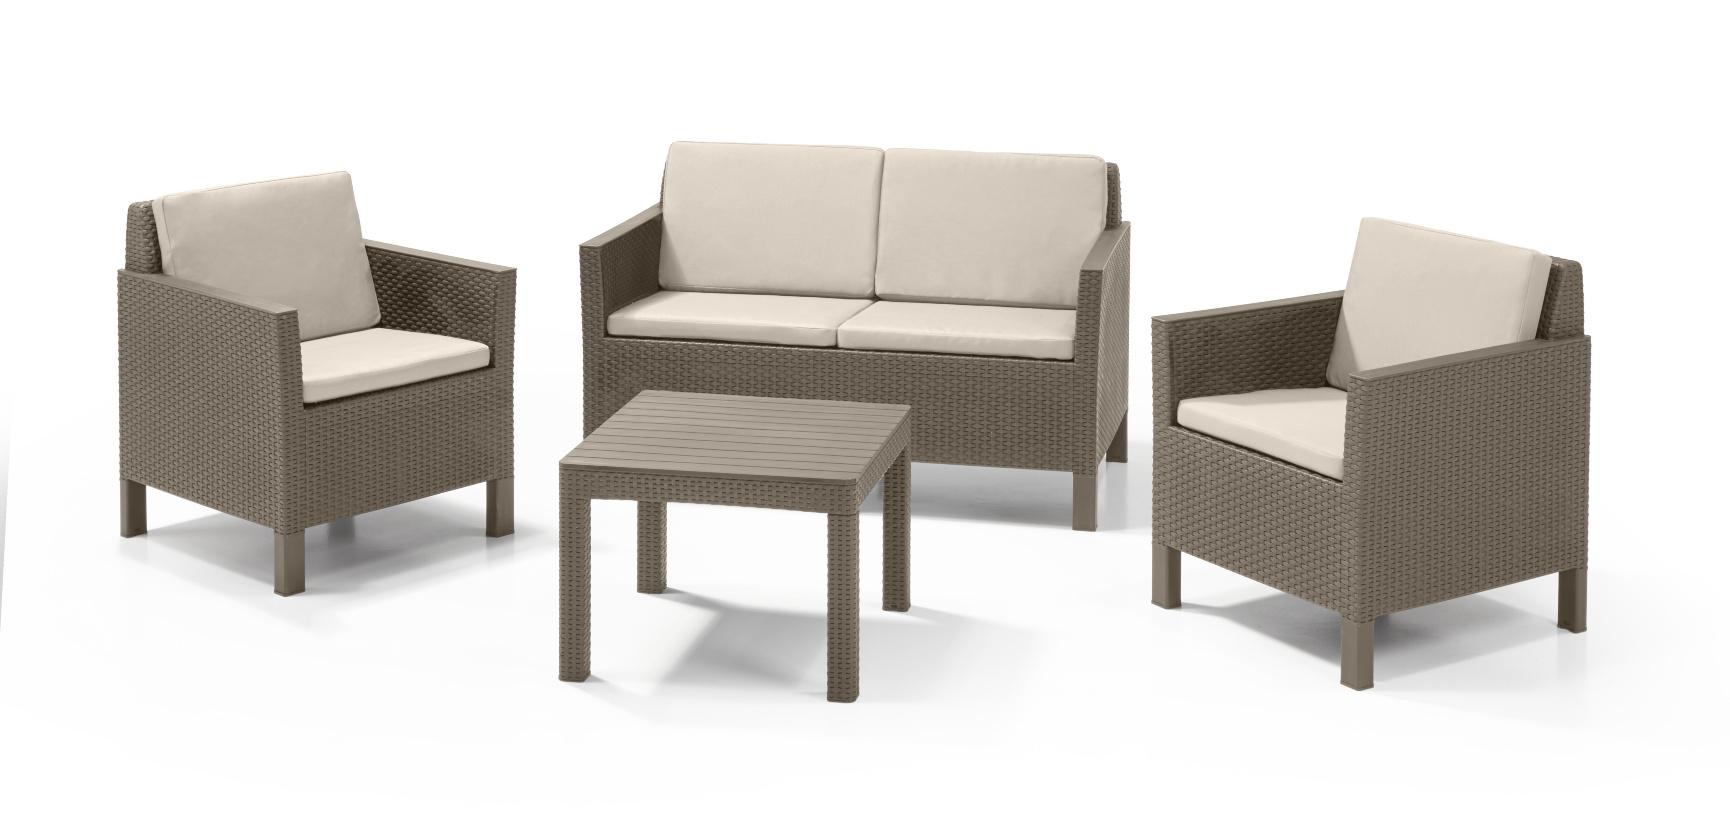 allibert chicago lounge set cappuccino zweisitzer sofa allibert. Black Bedroom Furniture Sets. Home Design Ideas